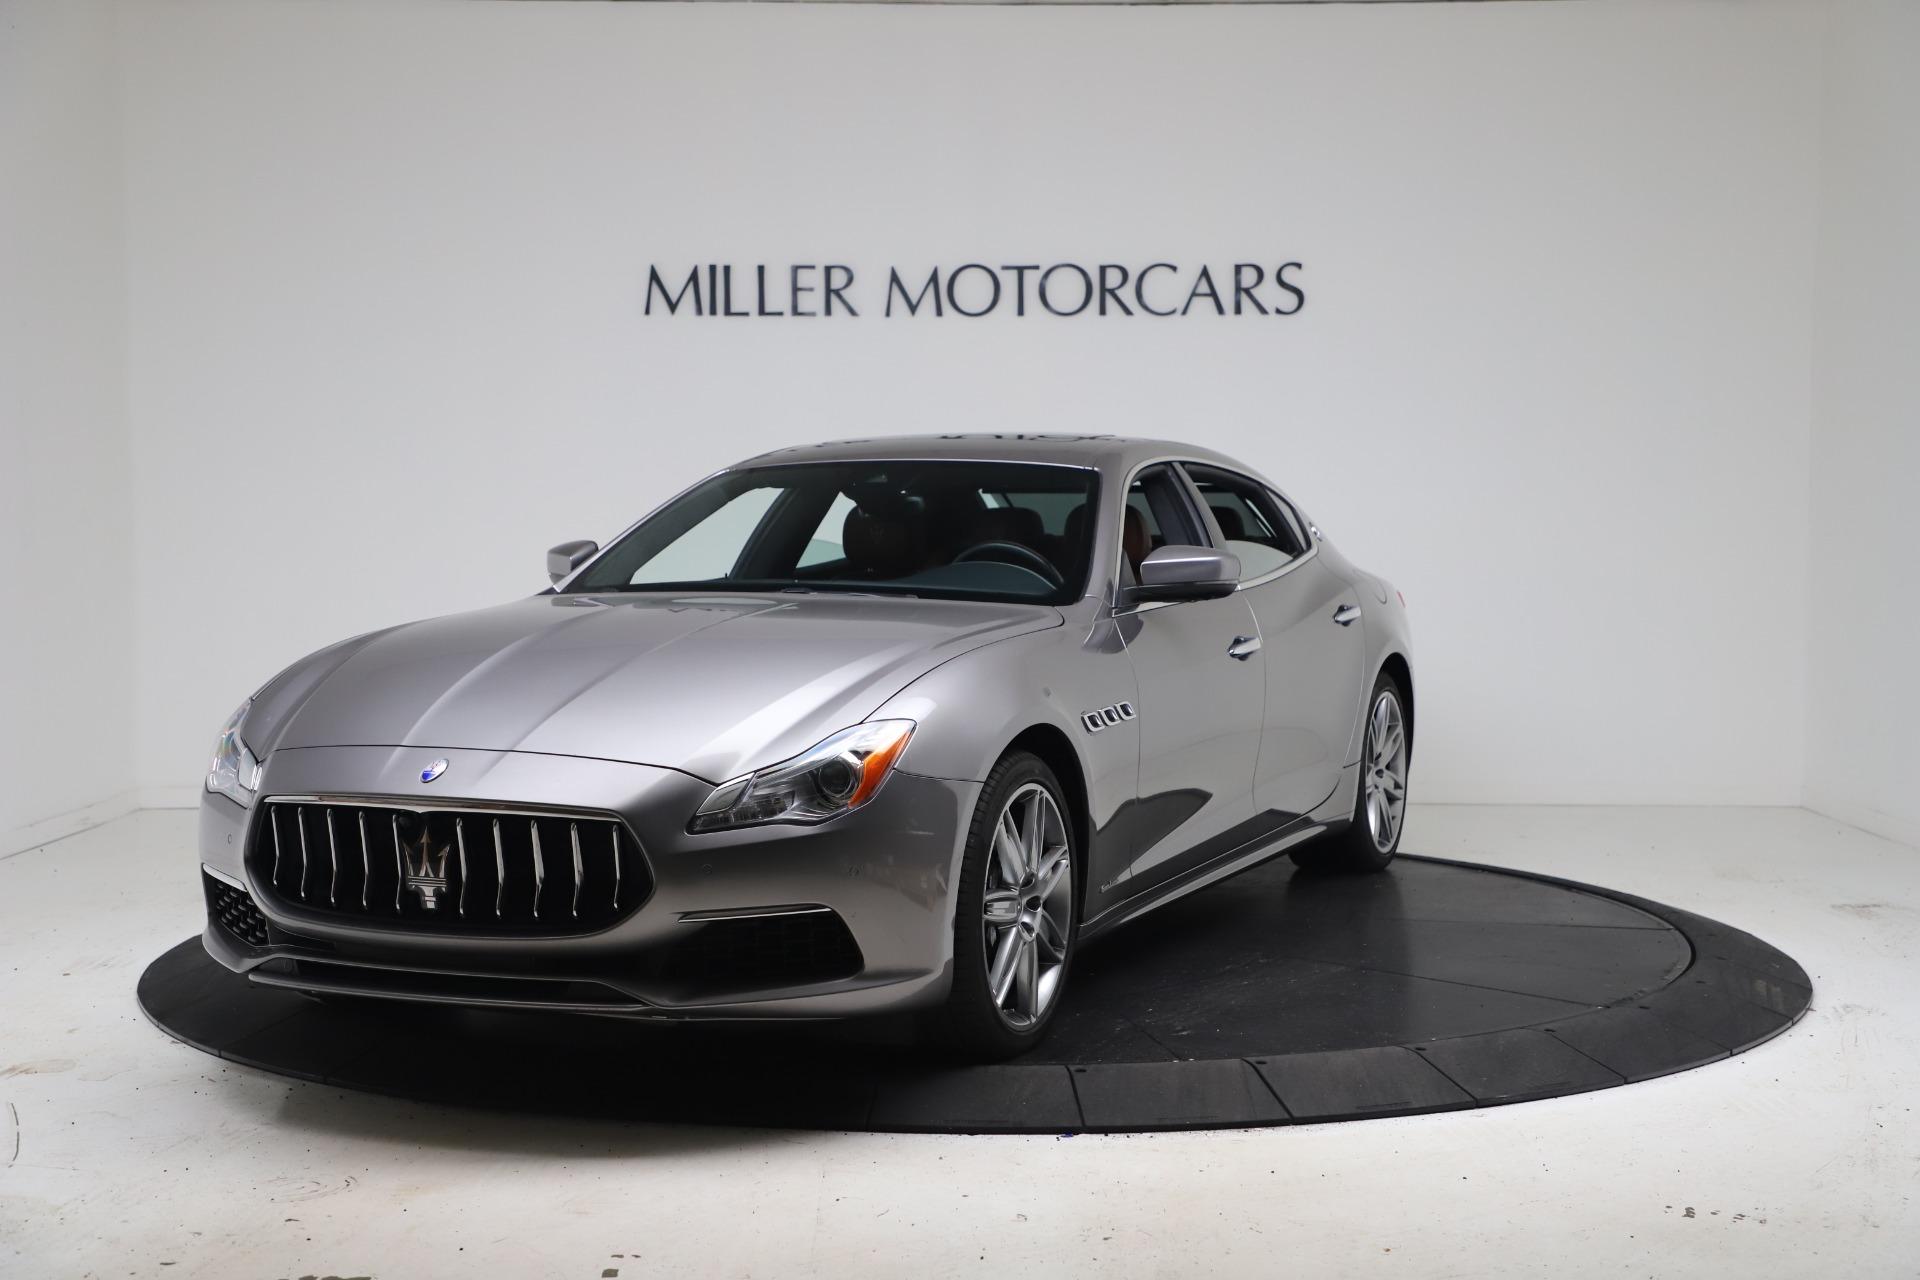 Used 2017 Maserati Quattroporte SQ4 GranLusso/ Zegna for sale $62,900 at Bentley Greenwich in Greenwich CT 06830 1